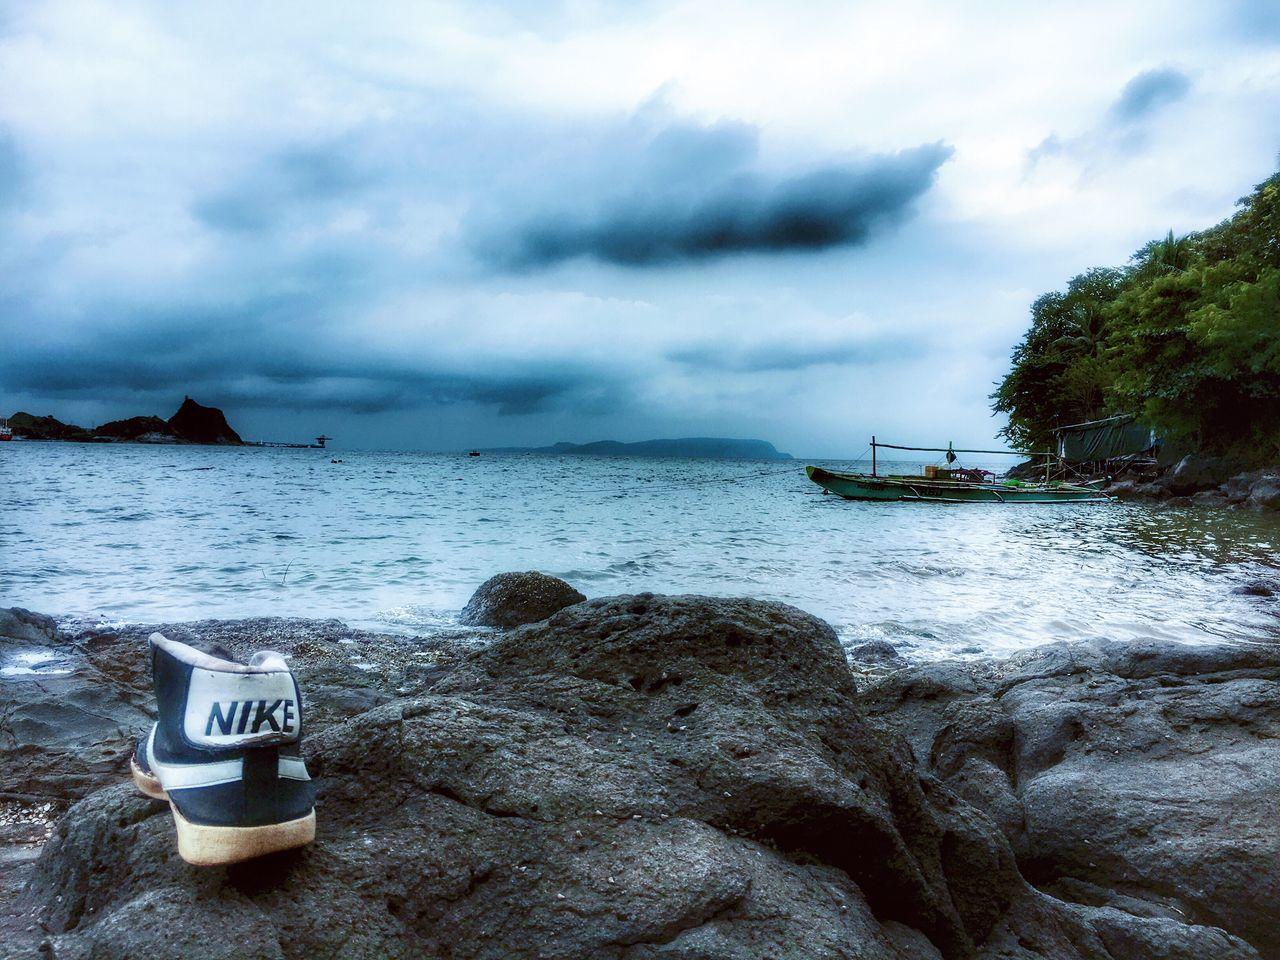 Just do it! Eyeem Philippines Nautical Vessel Nature Tranquil Scene TravelPhilippines EyeEm Nature Lover Shoe No People Nike✔